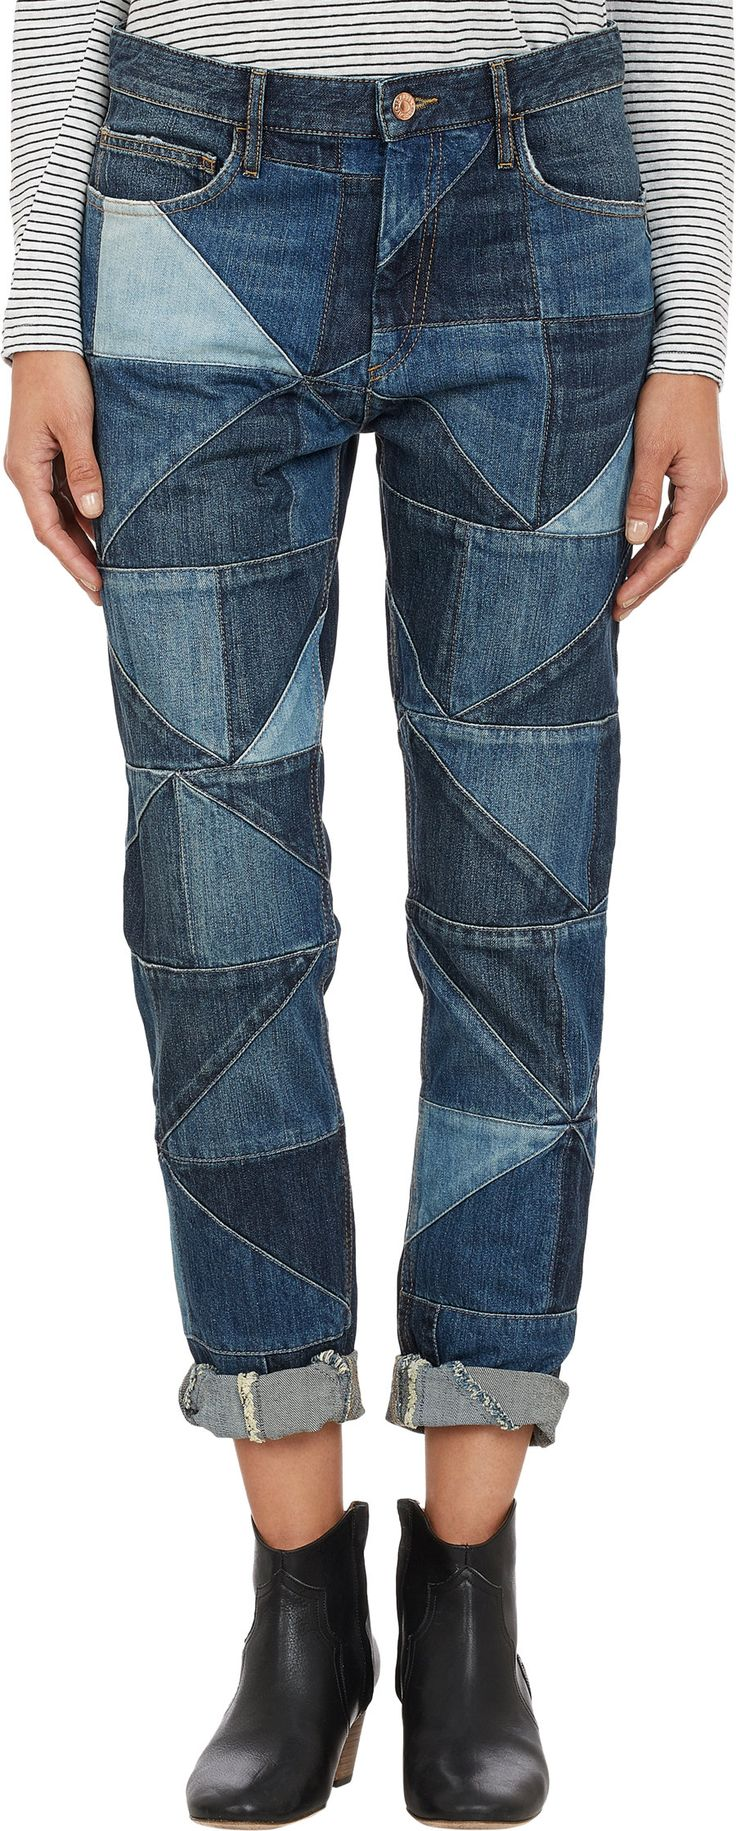 Isabel Marant Étoile Patchwork Dillon Jeans at Barneys.com